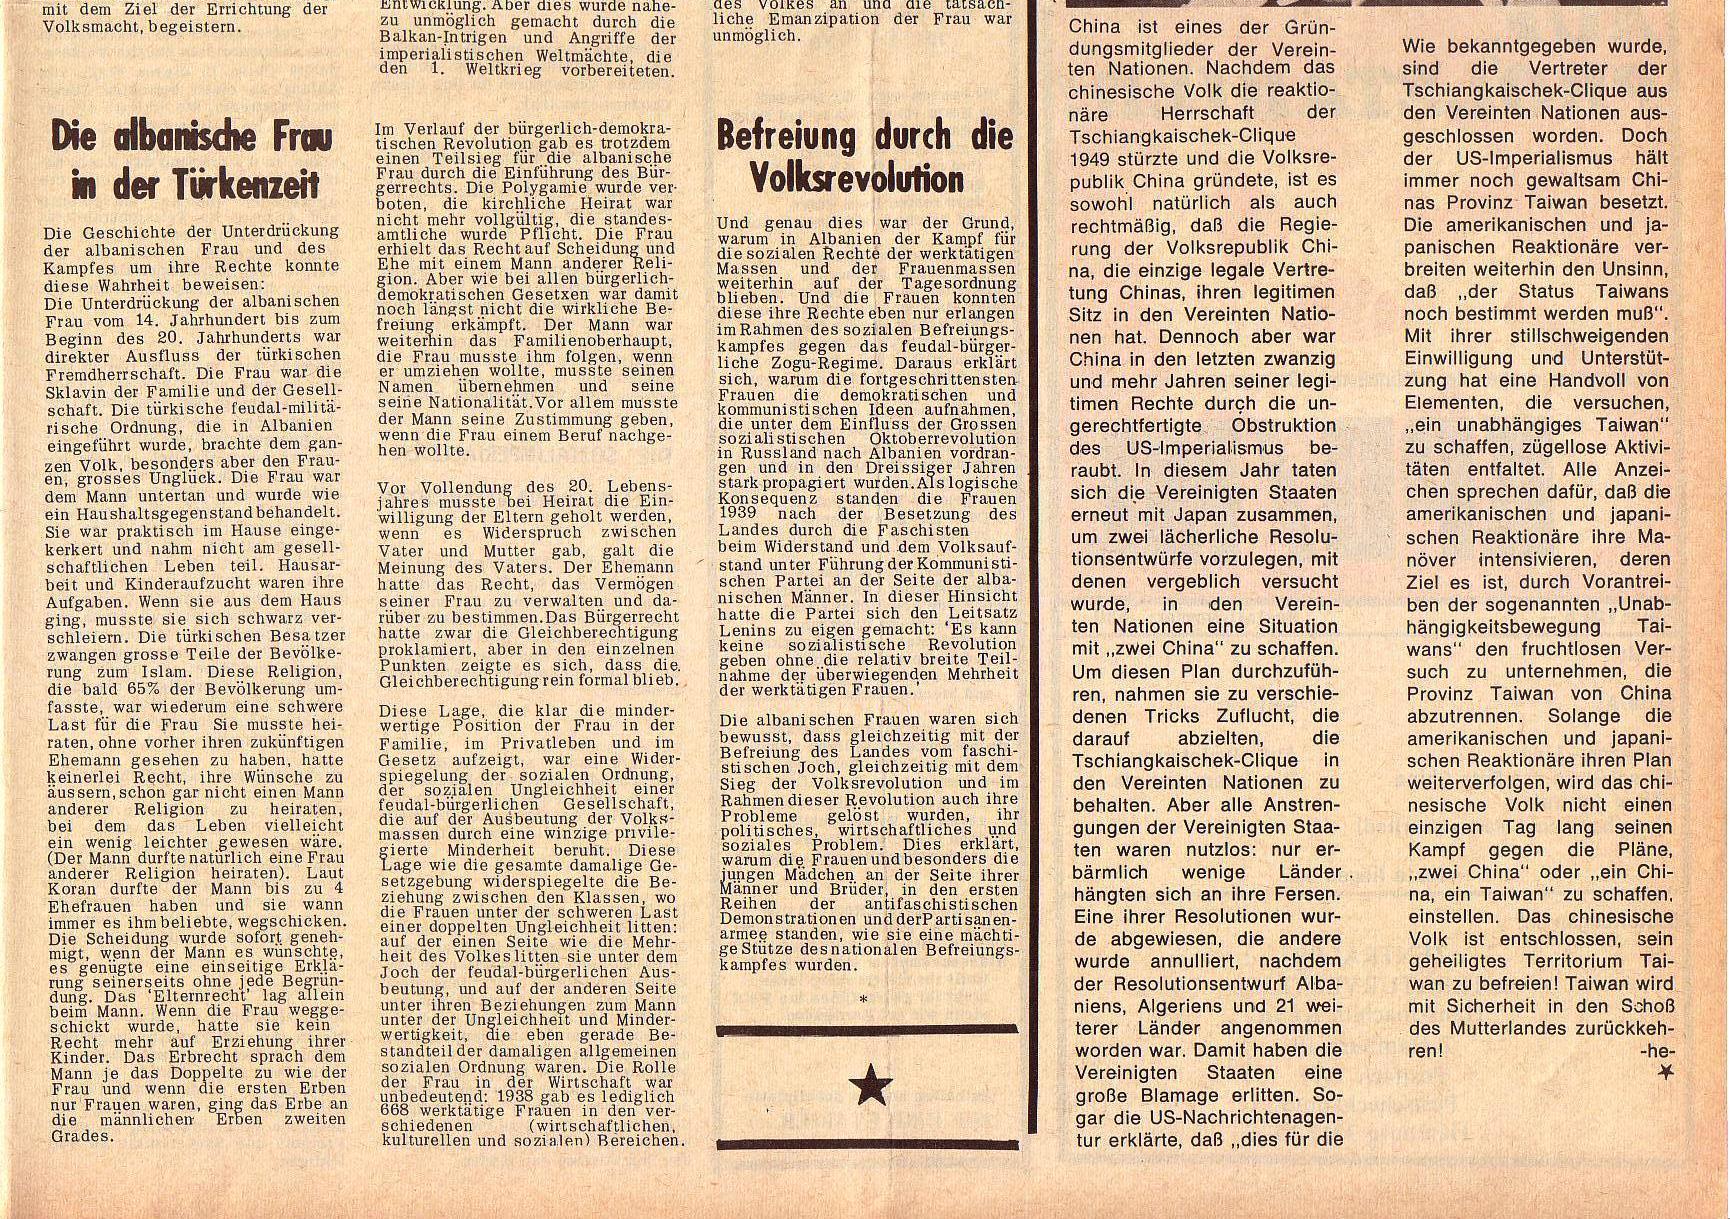 Roter Morgen, 5. Jg., 27. Dezember 1971, Nr. 16, Seite 7b